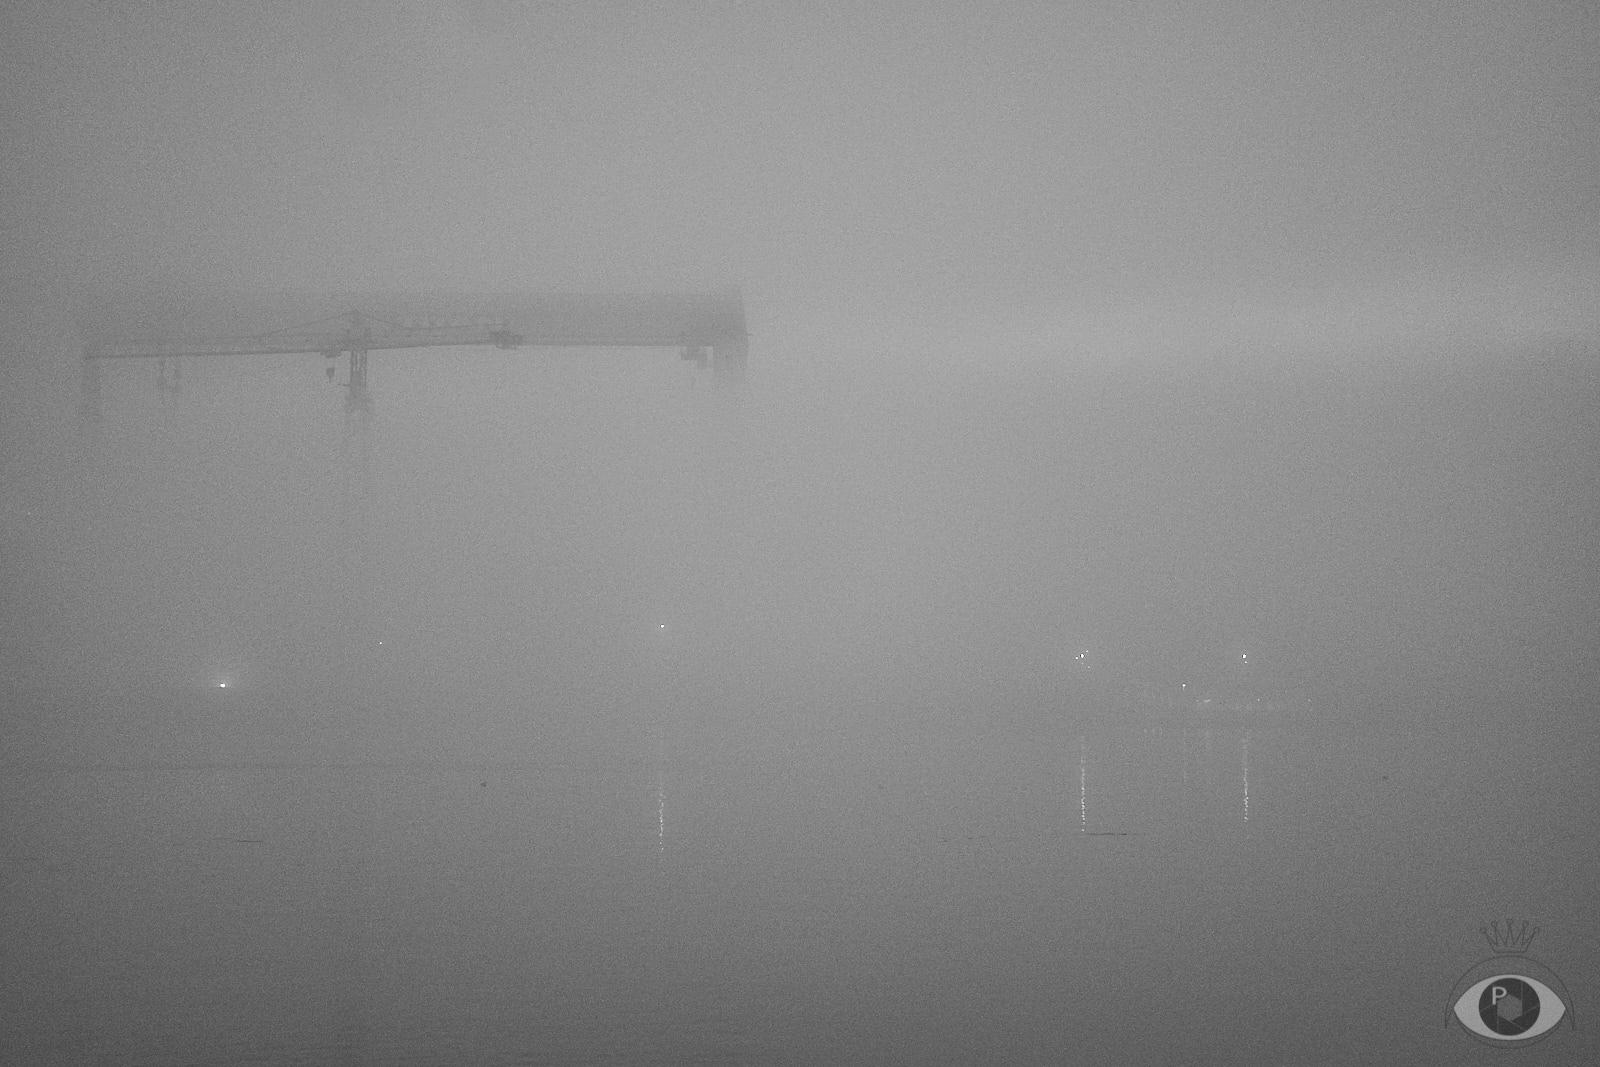 Mist. morning fog thick stretch - pentaxke | ello